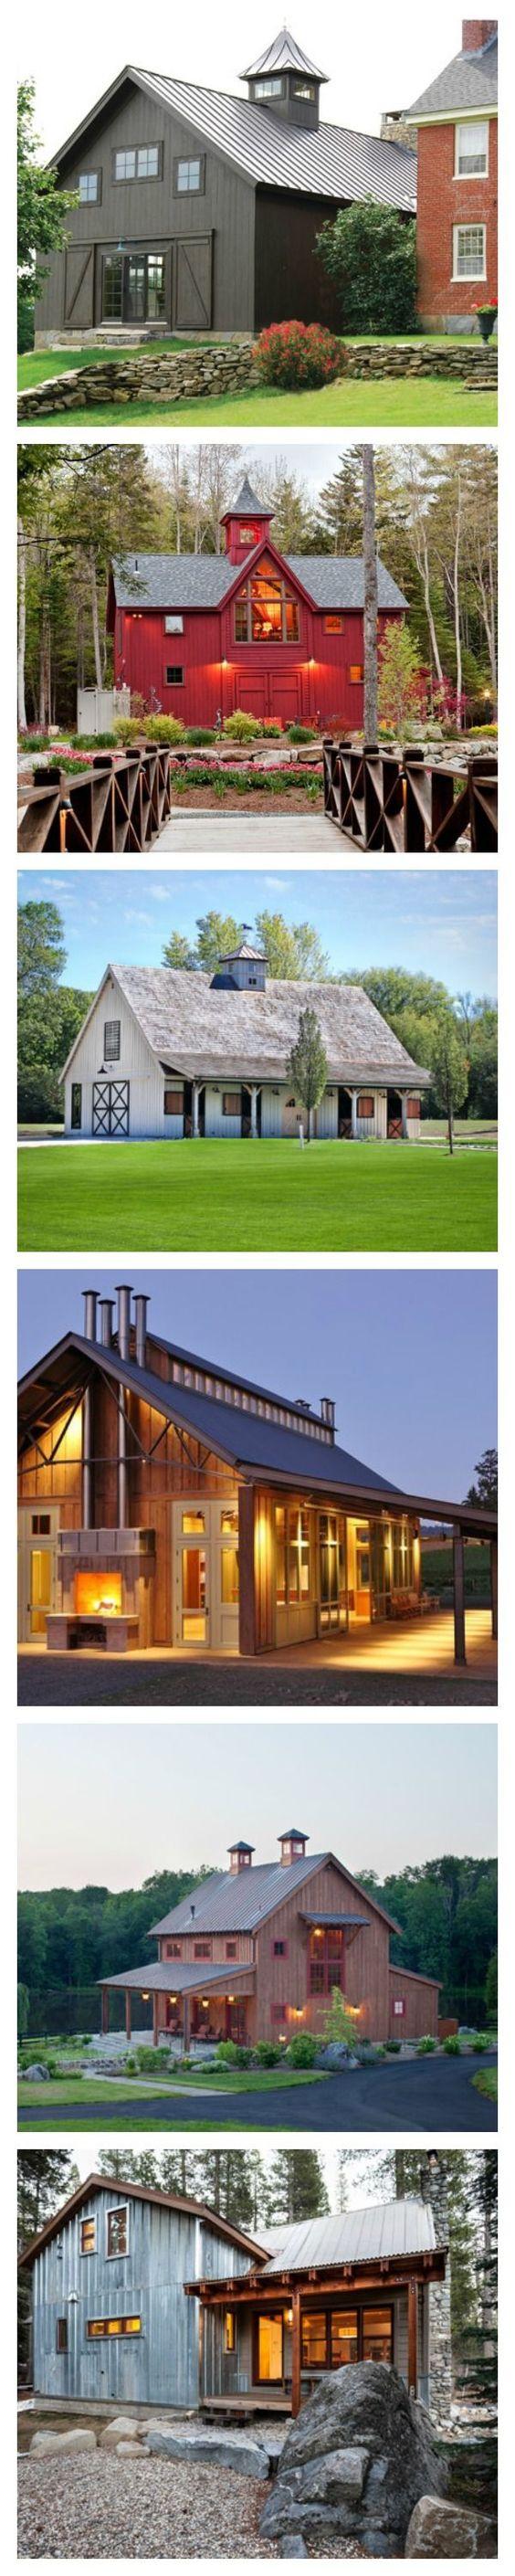 Unique pole barn houses joy studio - Pole Barn Home Design Idea Pictures Popular Pin Ideas Pole Barn House Plans Pinterest Popular Pins Barn And House